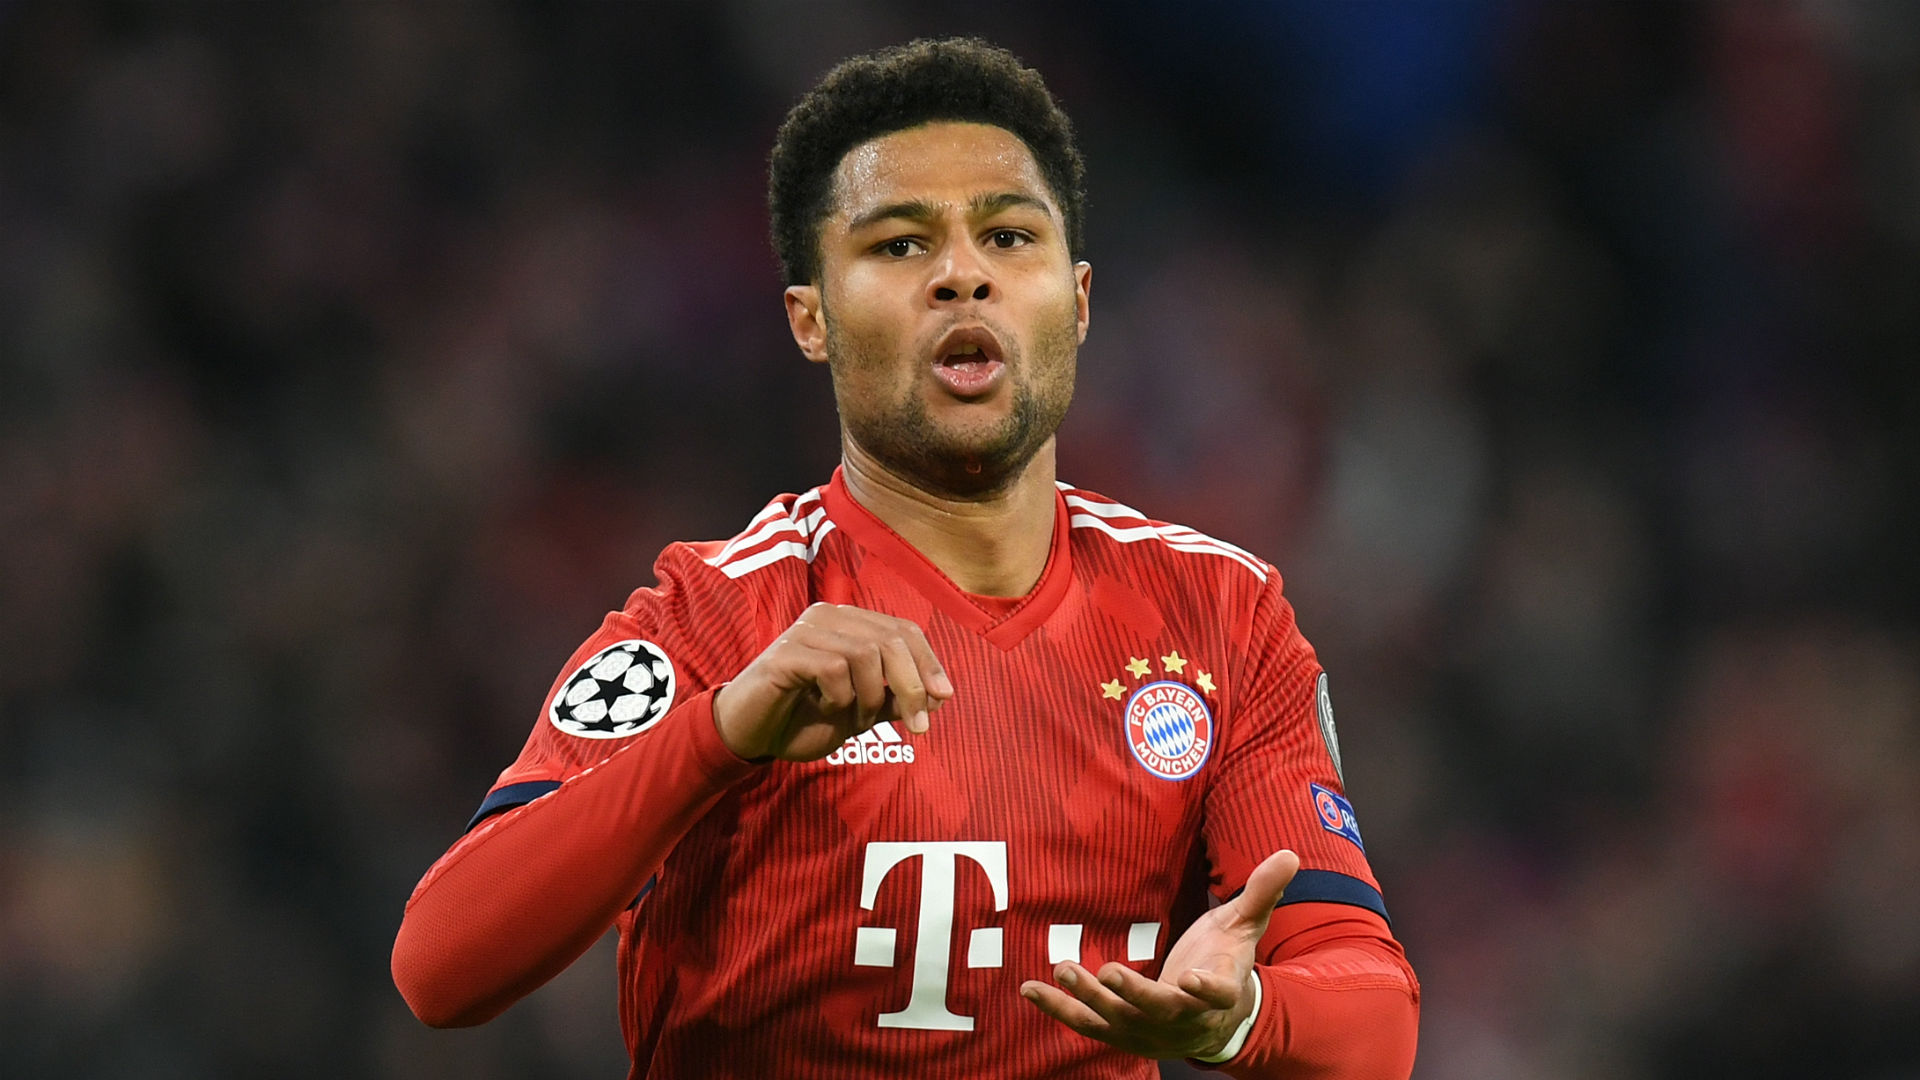 Serge Gnabry FC Bayern München Liverpool 13032019